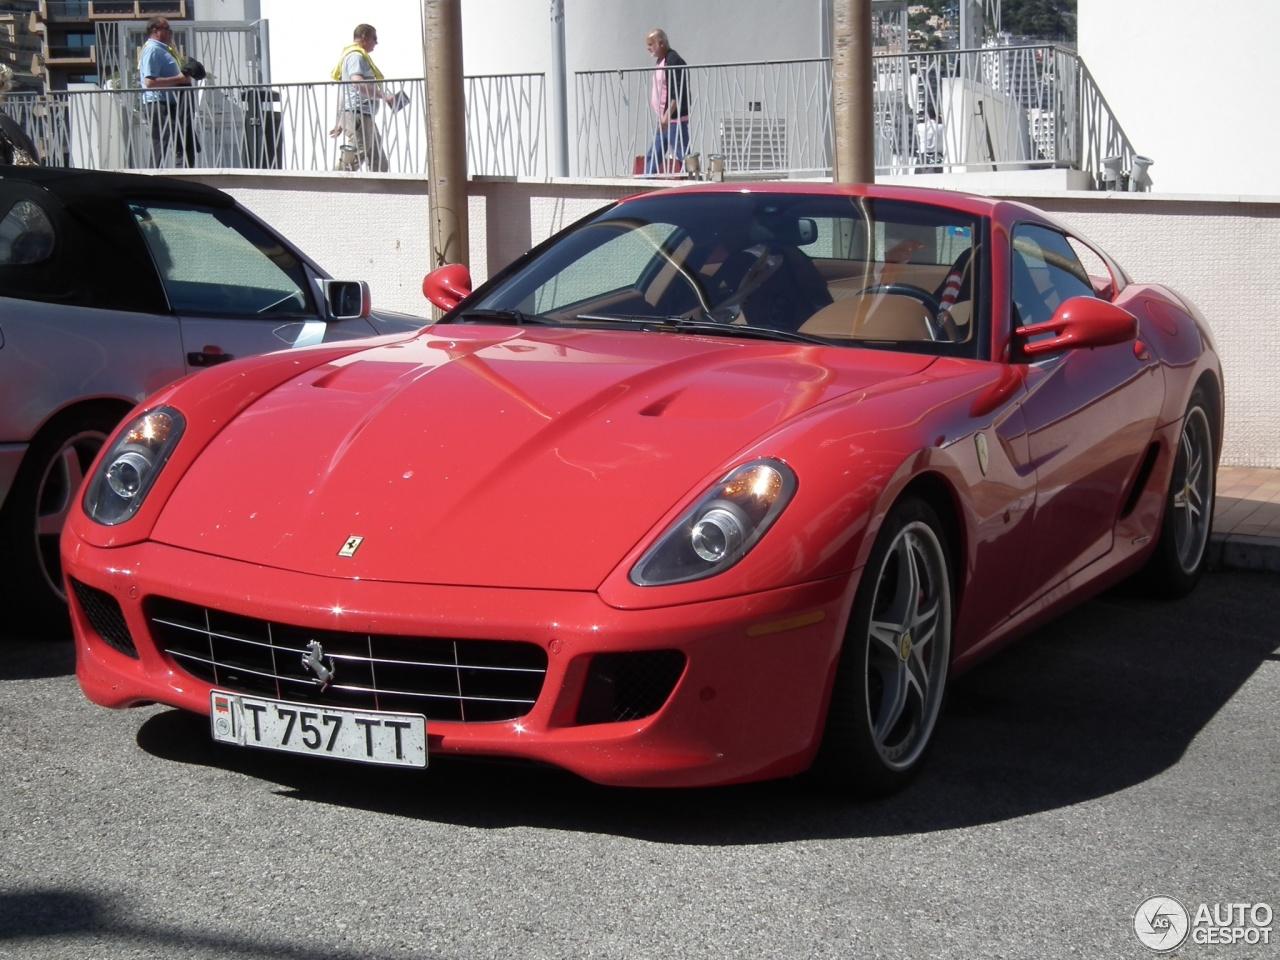 Ferrari 599 Gtb Fiorano Hgte 30 May 2013 Autogespot